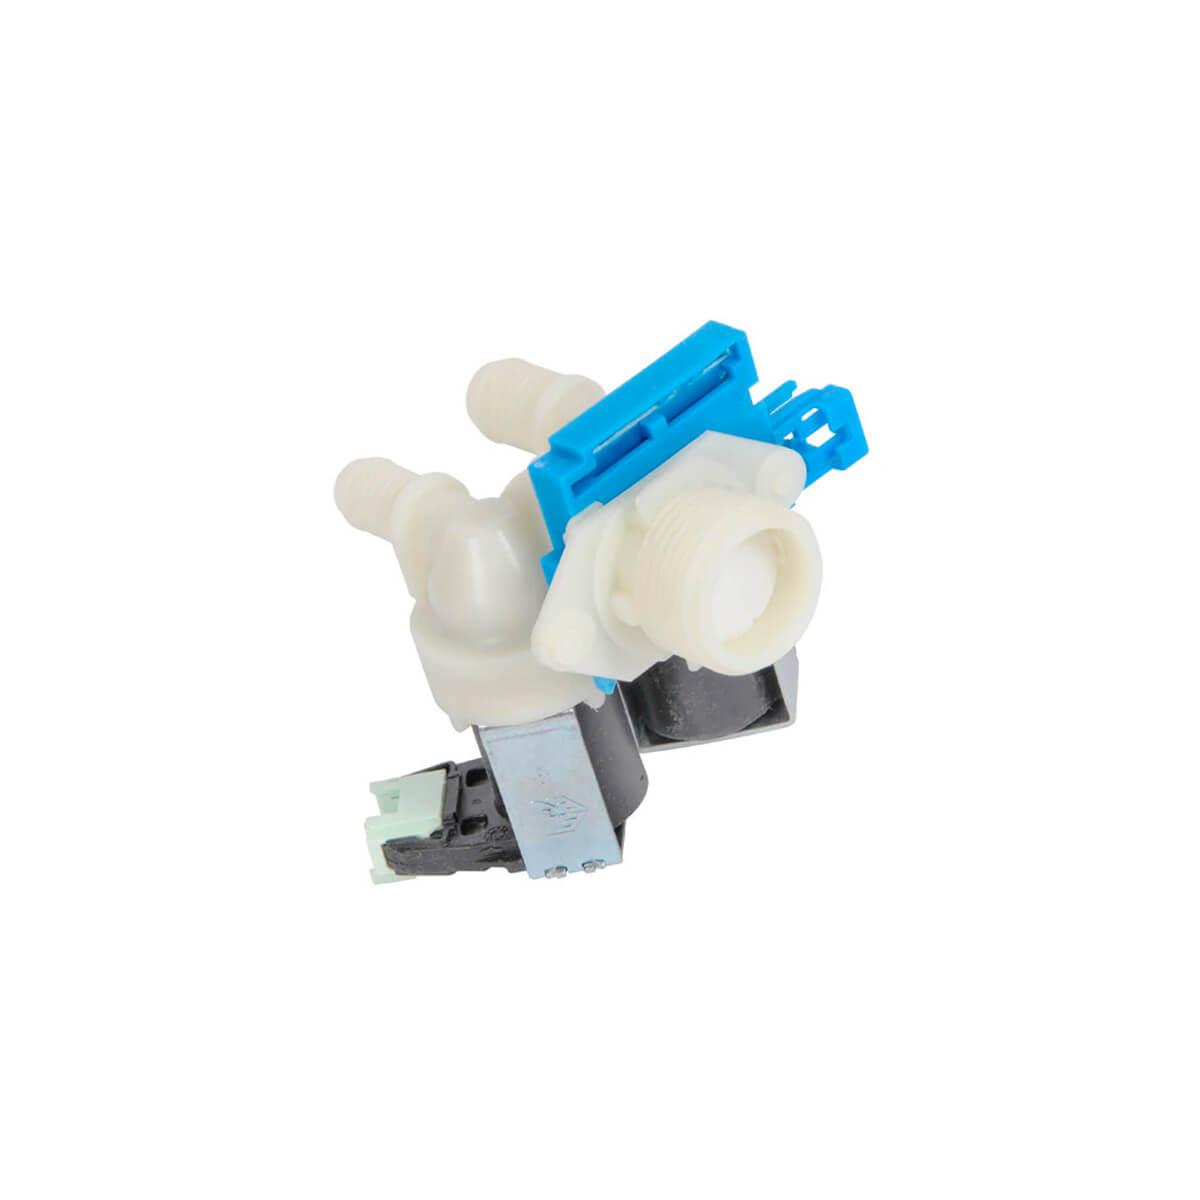 Válvula Entrada De Água Para Lavadora De Roupas Electrolux LFE10 - 4055017166